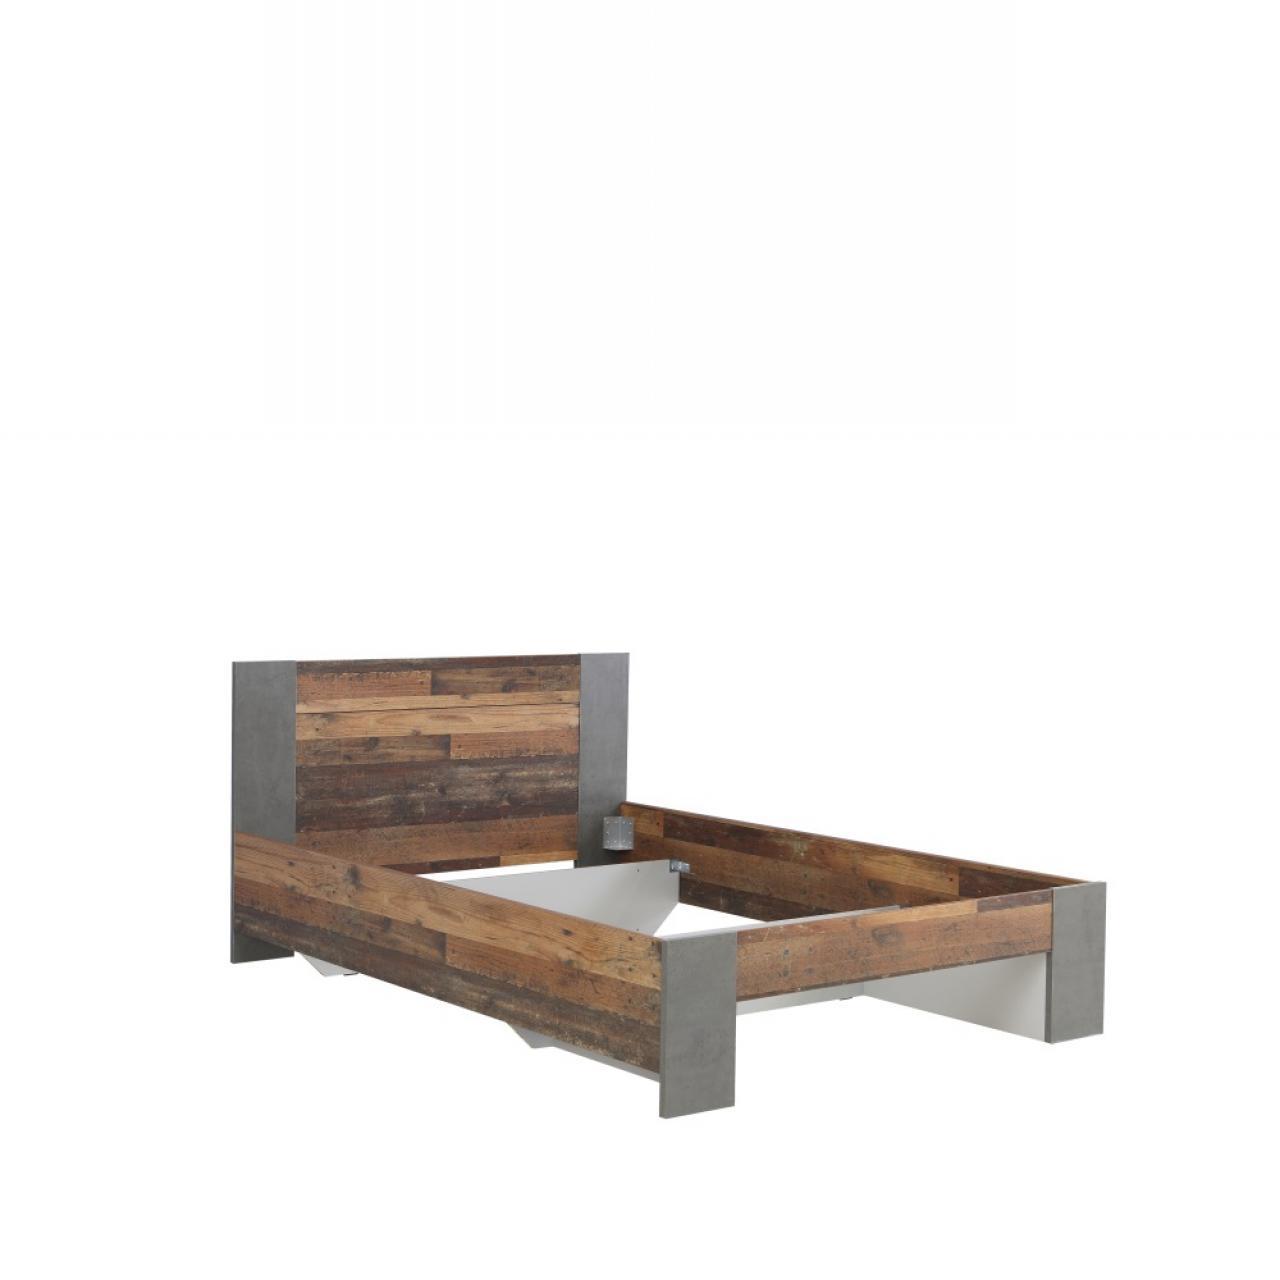 Liegegestell Clif 140x200 Jugendzimmer MDF Old Wood Vintage Nb. Betonoptik Bett